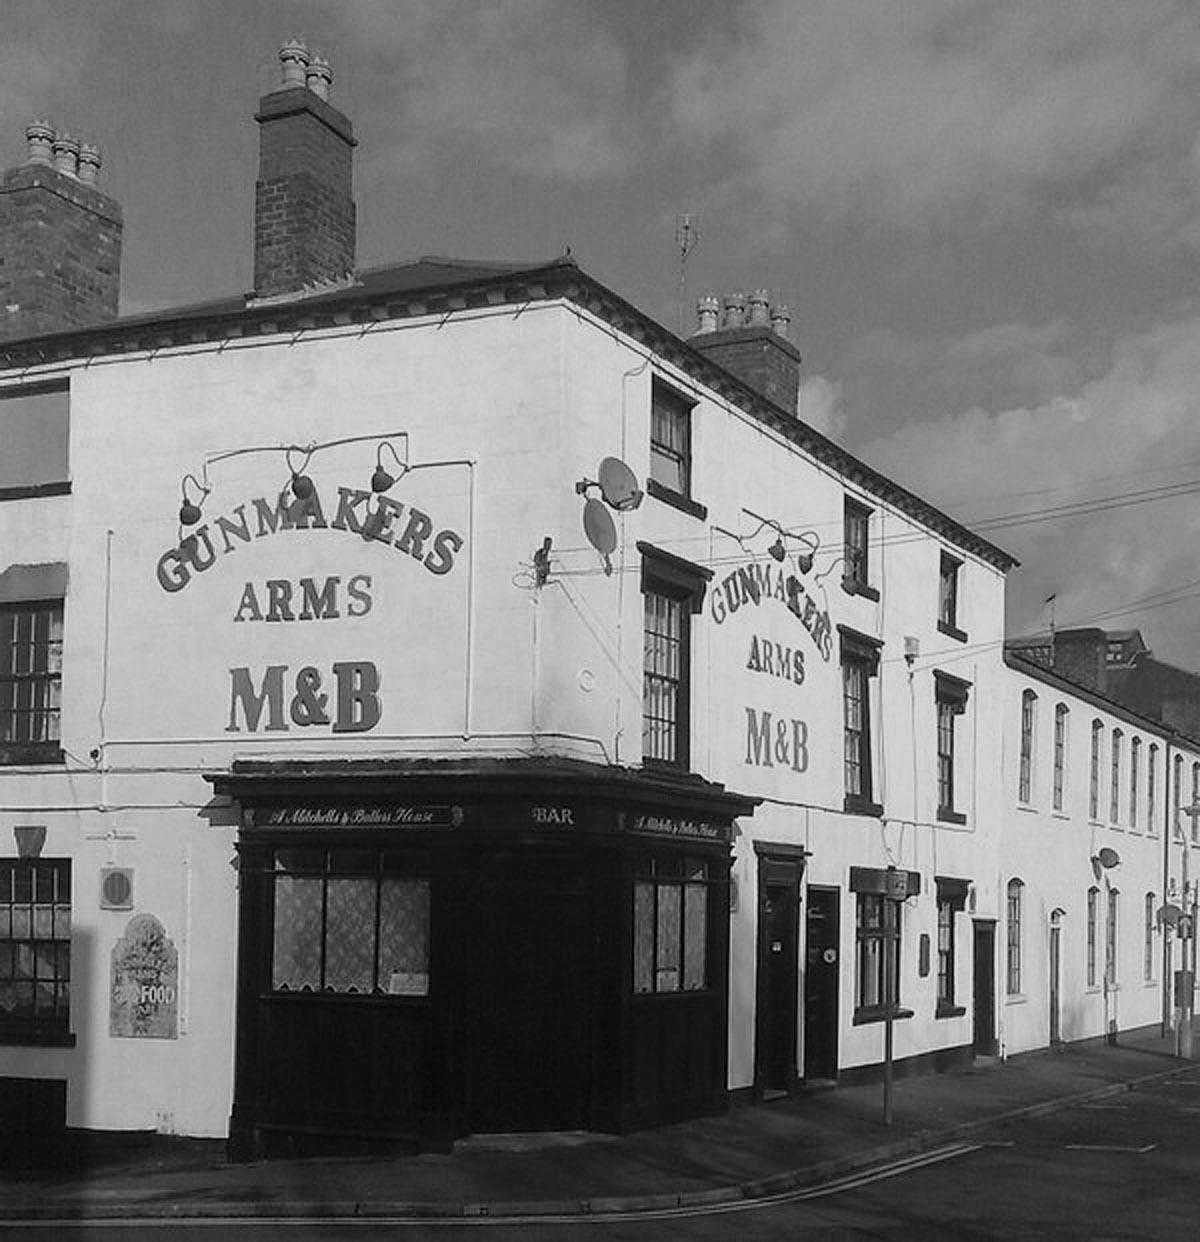 Gunmakers_Arms_towards_Bath_St2